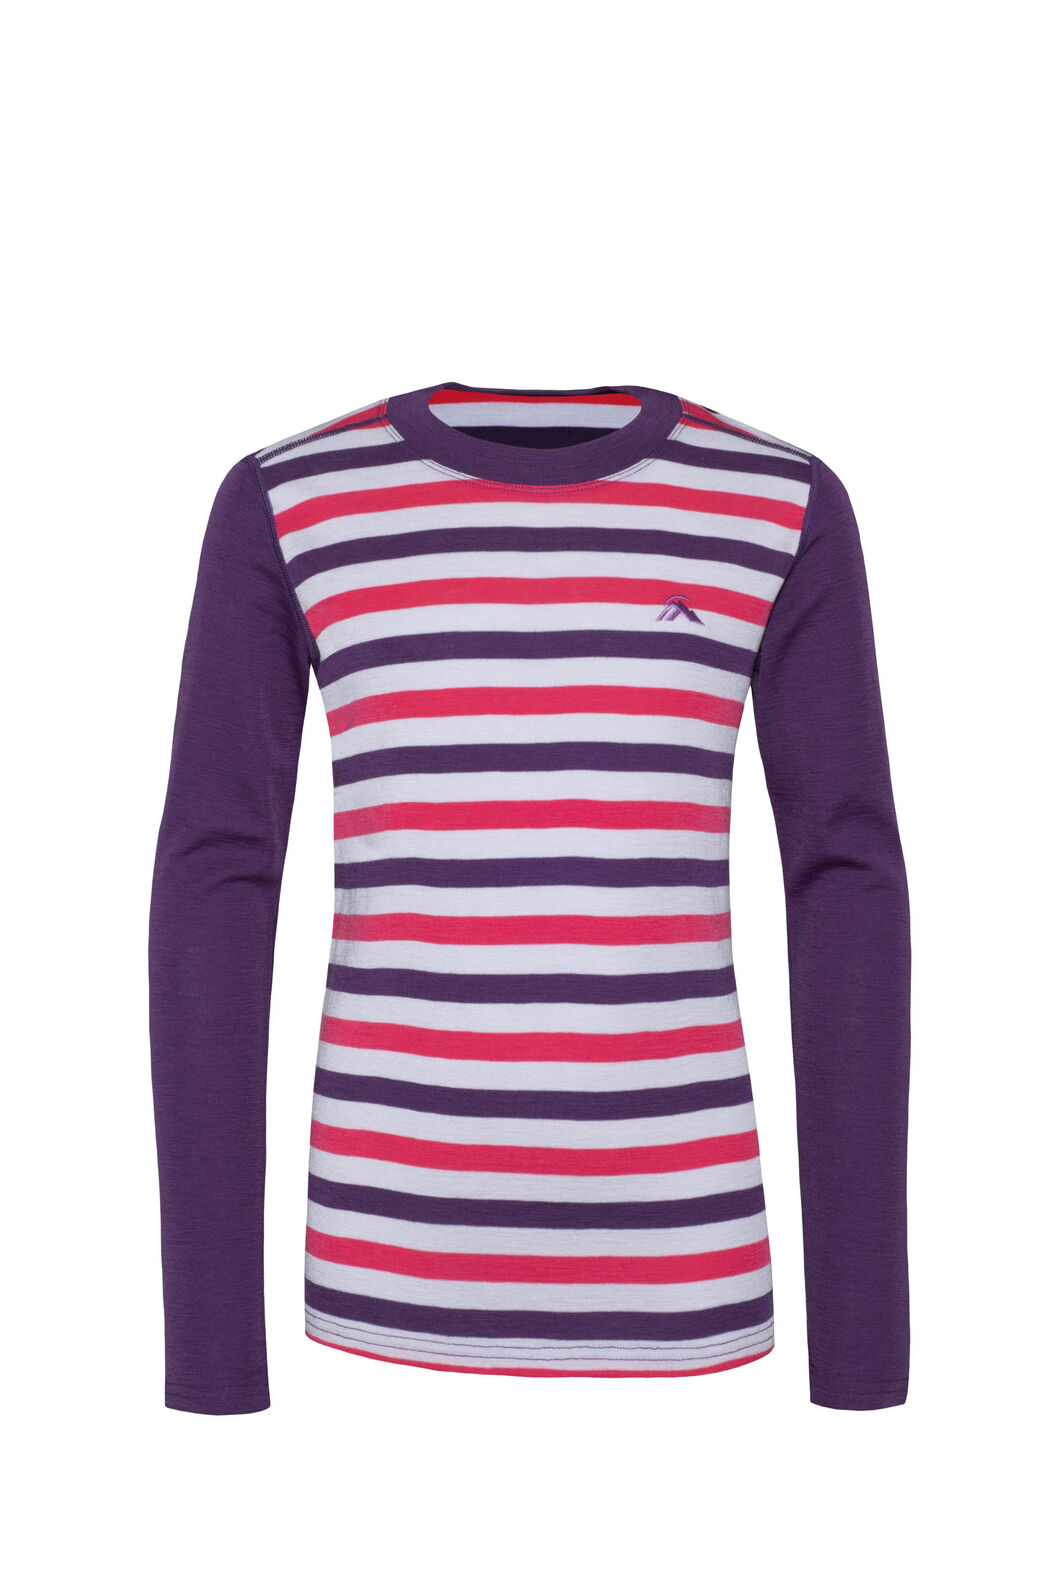 Macpac 220 Merino Long Sleeve Top — Kids', Wineberry Stripe, hi-res